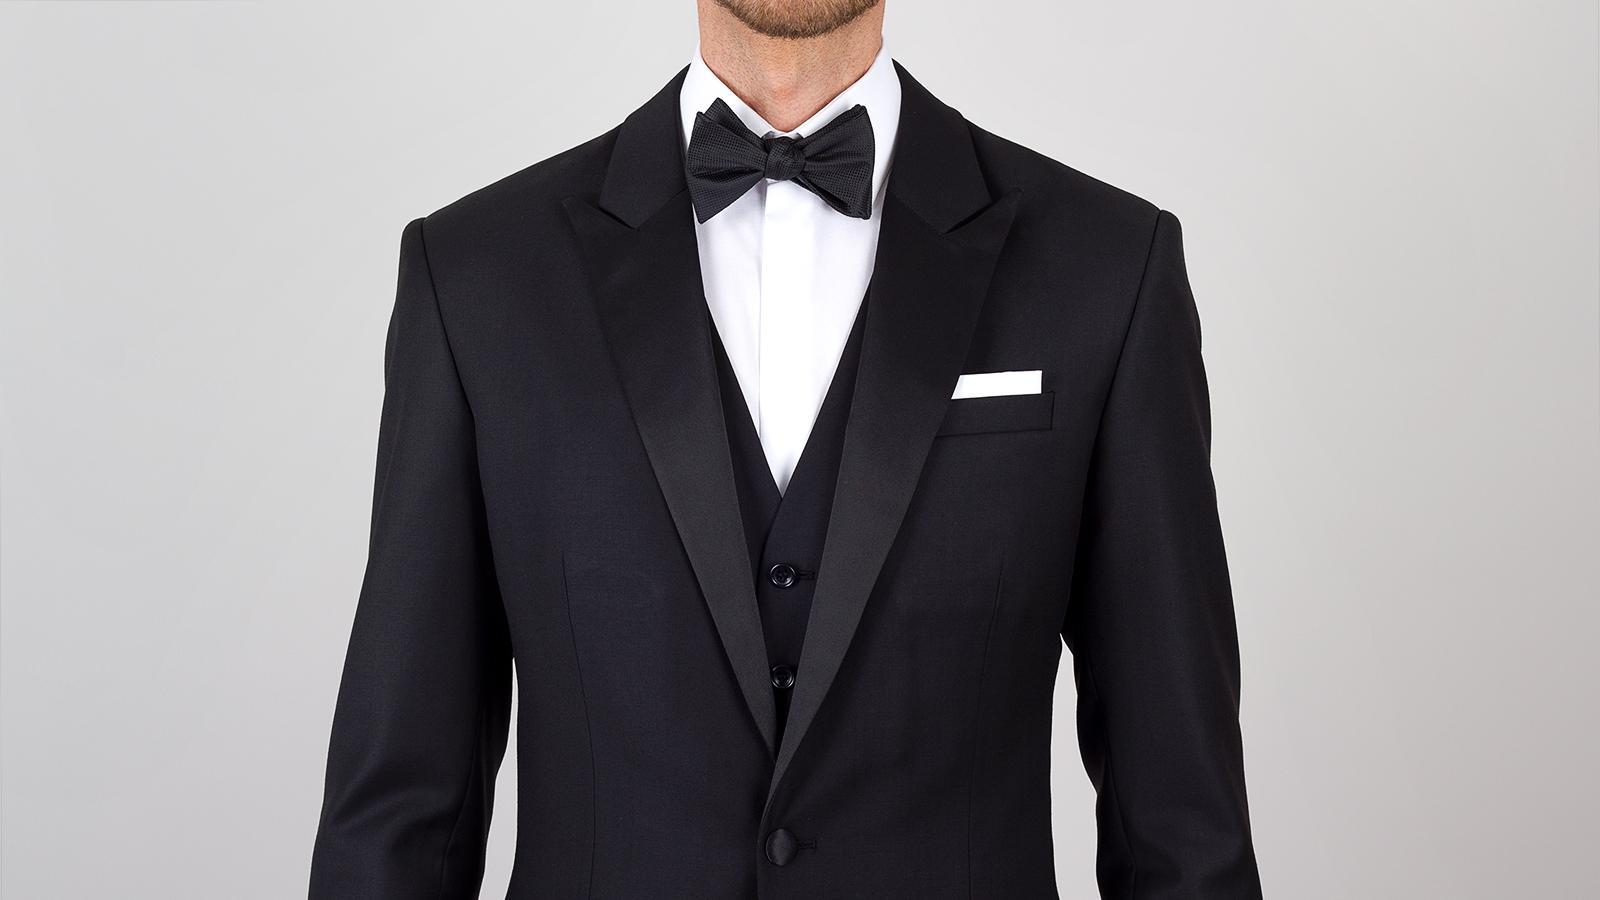 Essential Black 3 Piece Tuxedo in Italian Wool - slider image 1